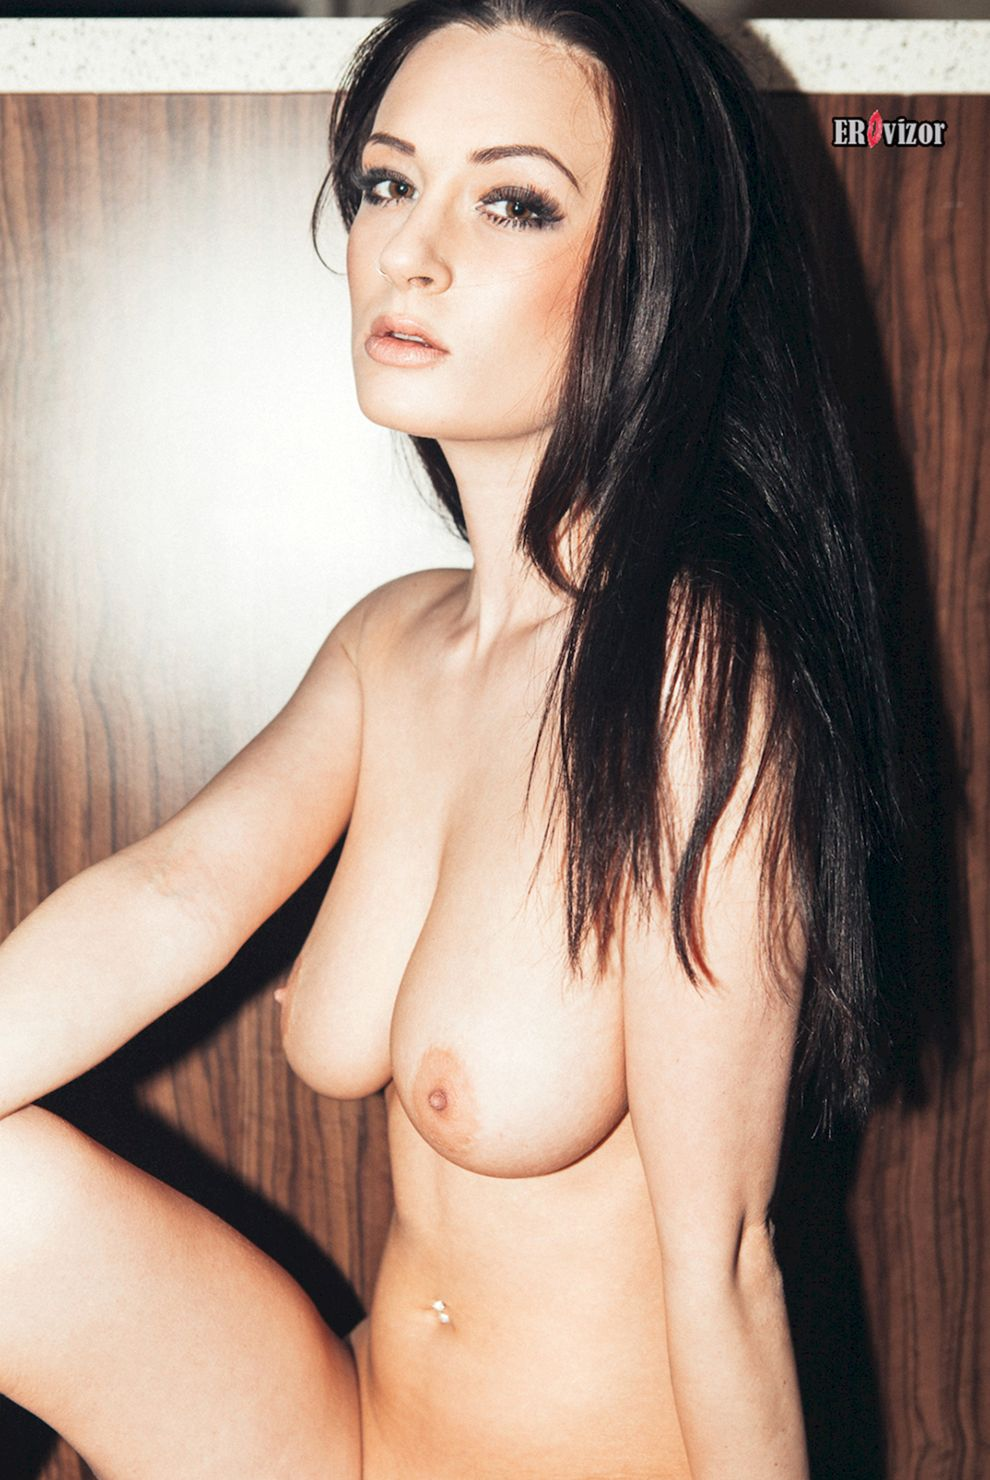 legkaya_erotica-erovizor (85)